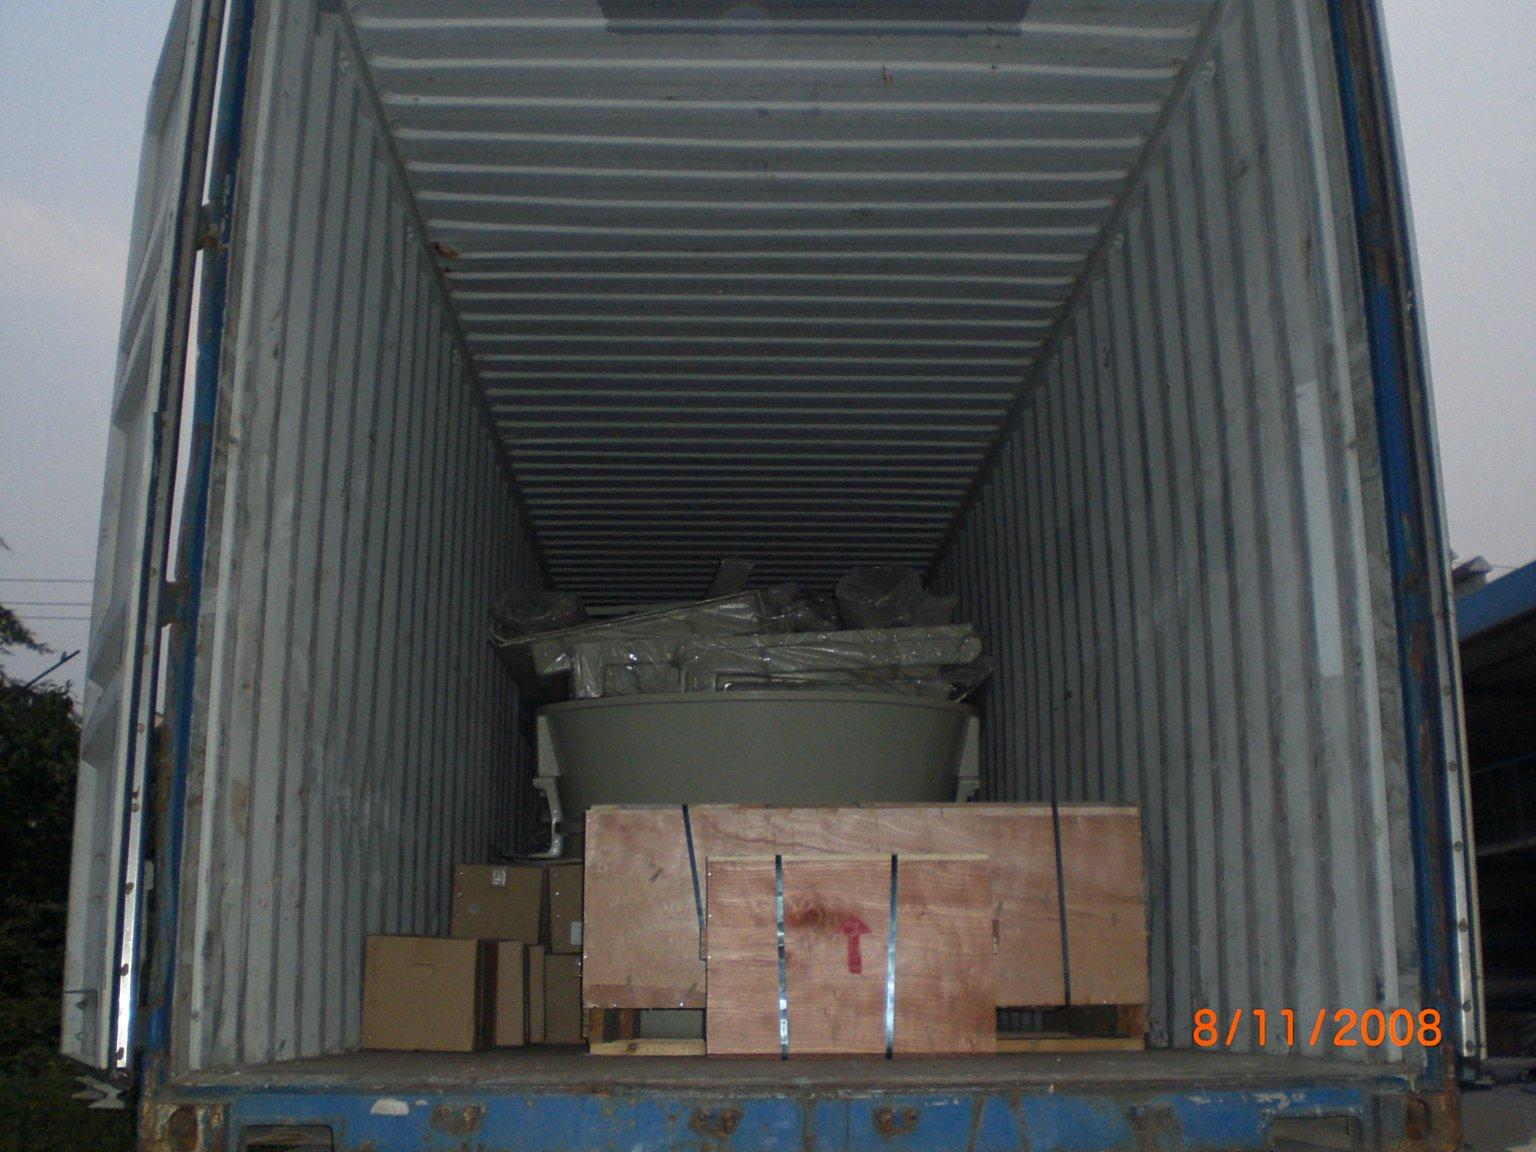 Shipments 0I